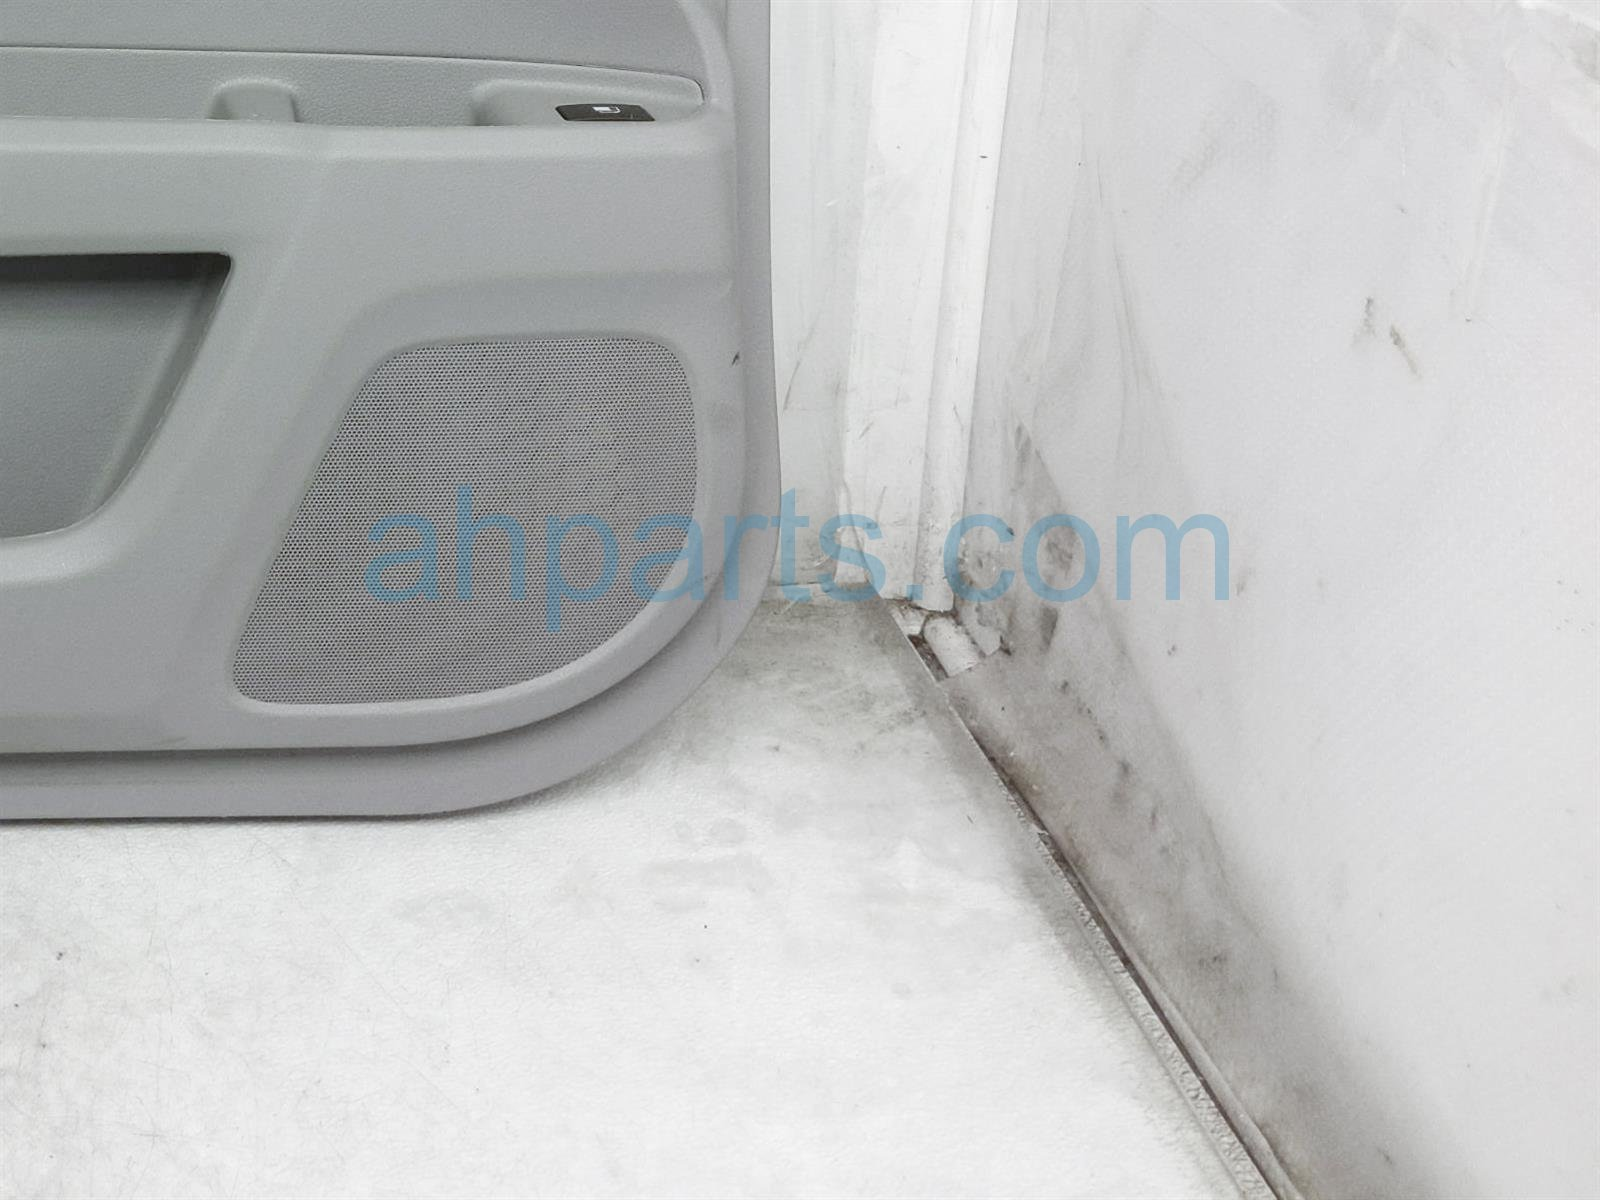 2019 Honda Pilot Trim / Liner Front Driver Interior Door Panel   Grey 83551 TG7 A02ZC Replacement